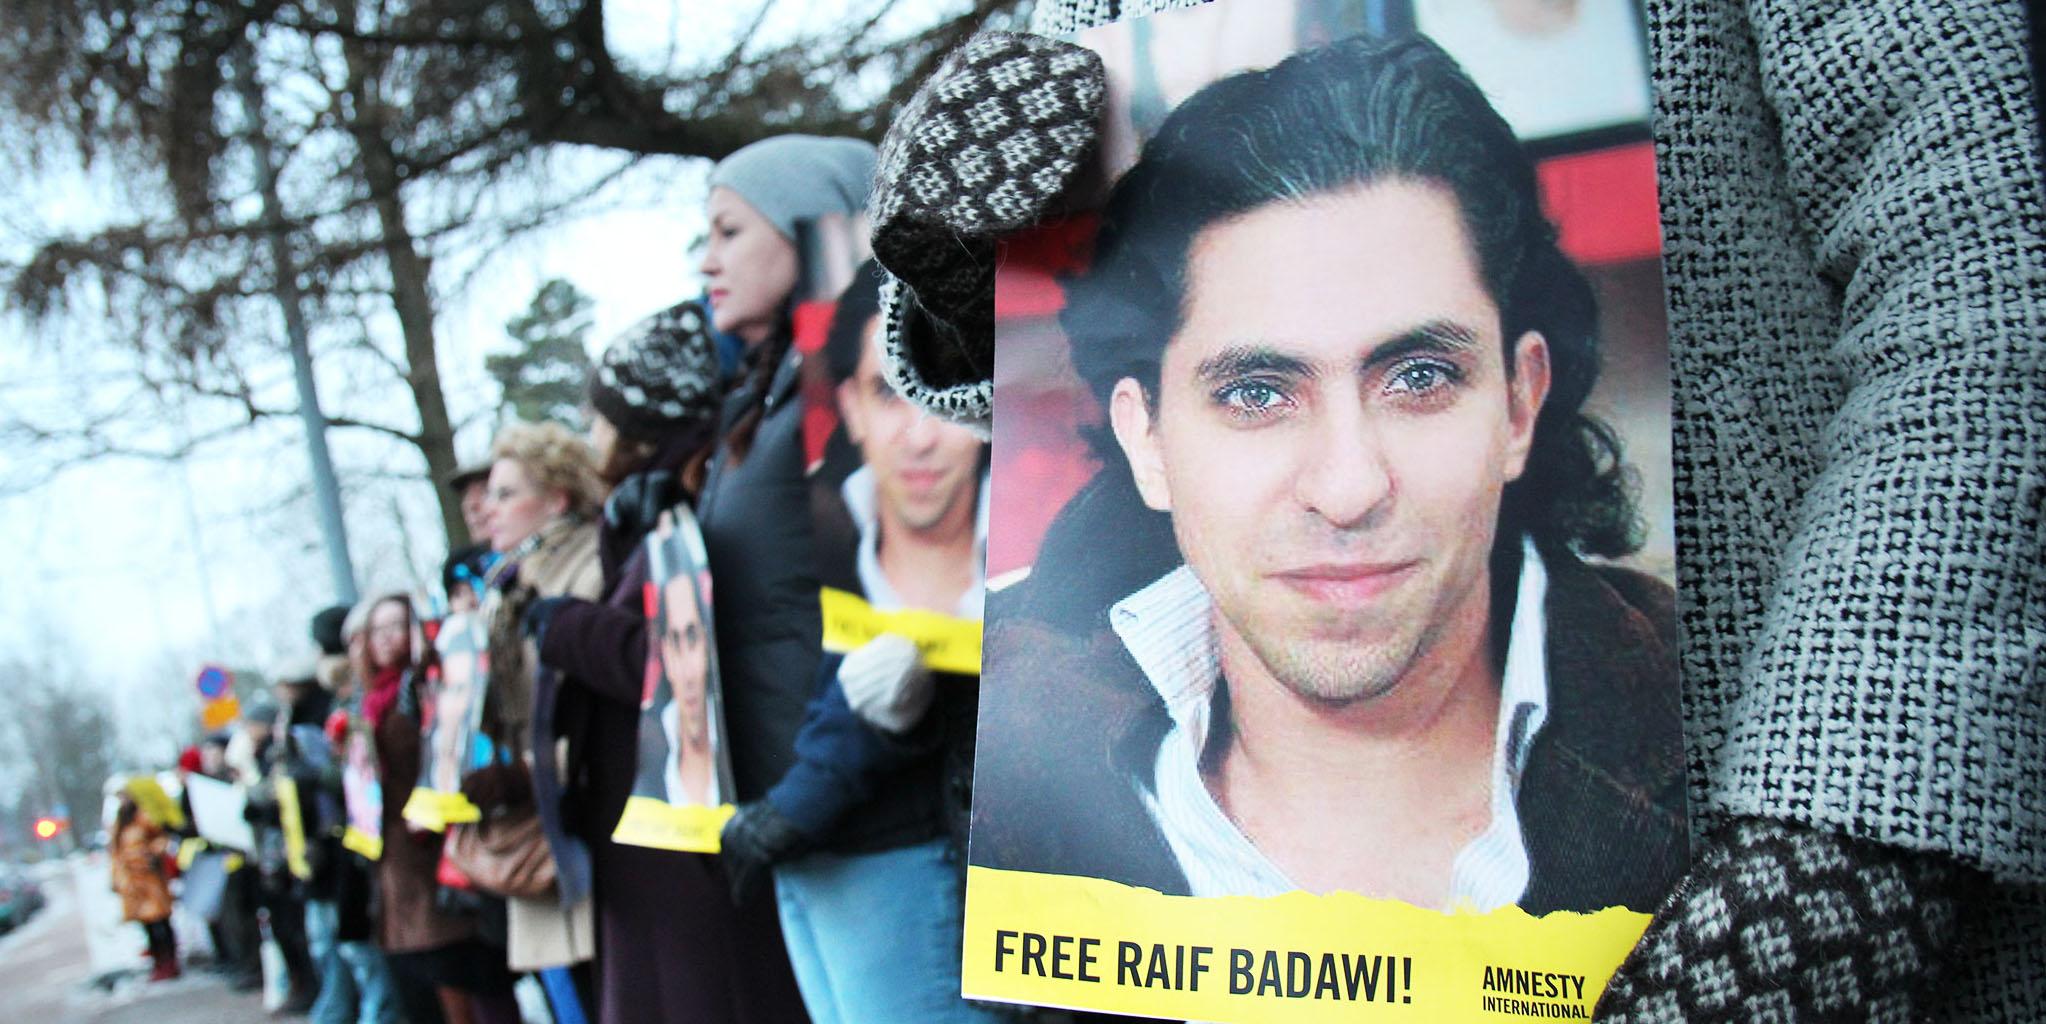 Protestors call for Raif Badawi's freedom.